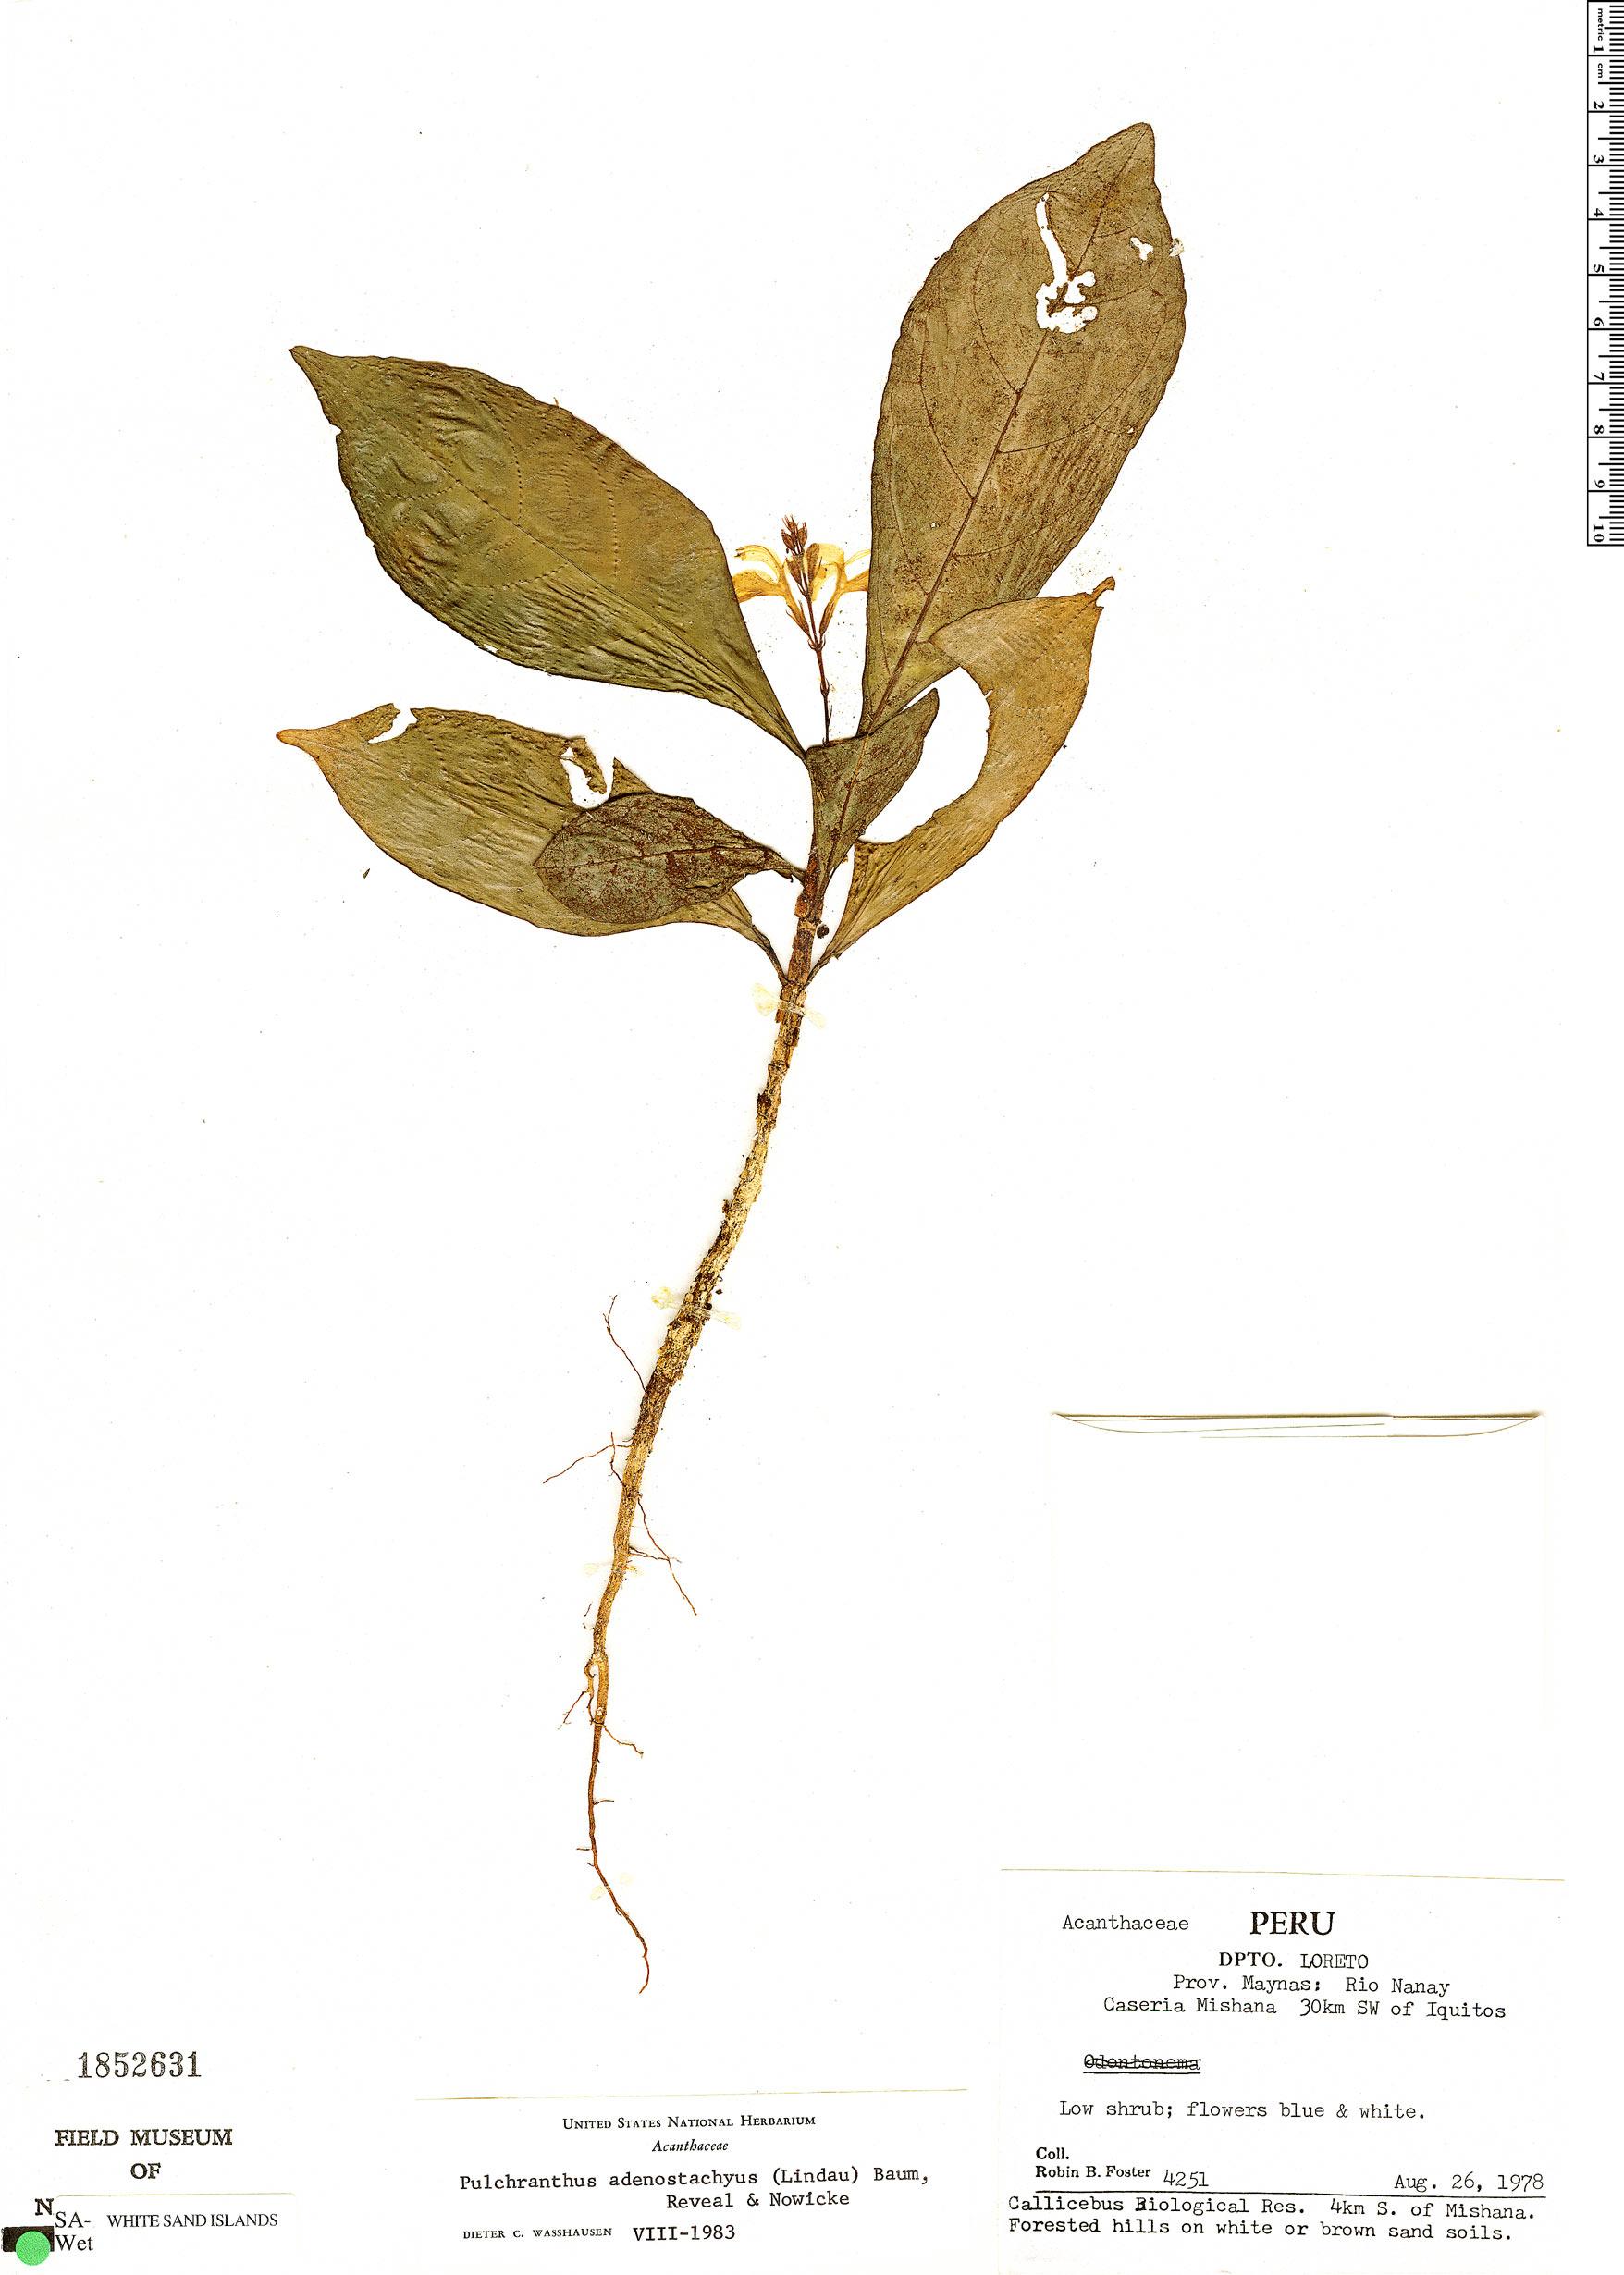 Specimen: Pulchranthus adenostachyus